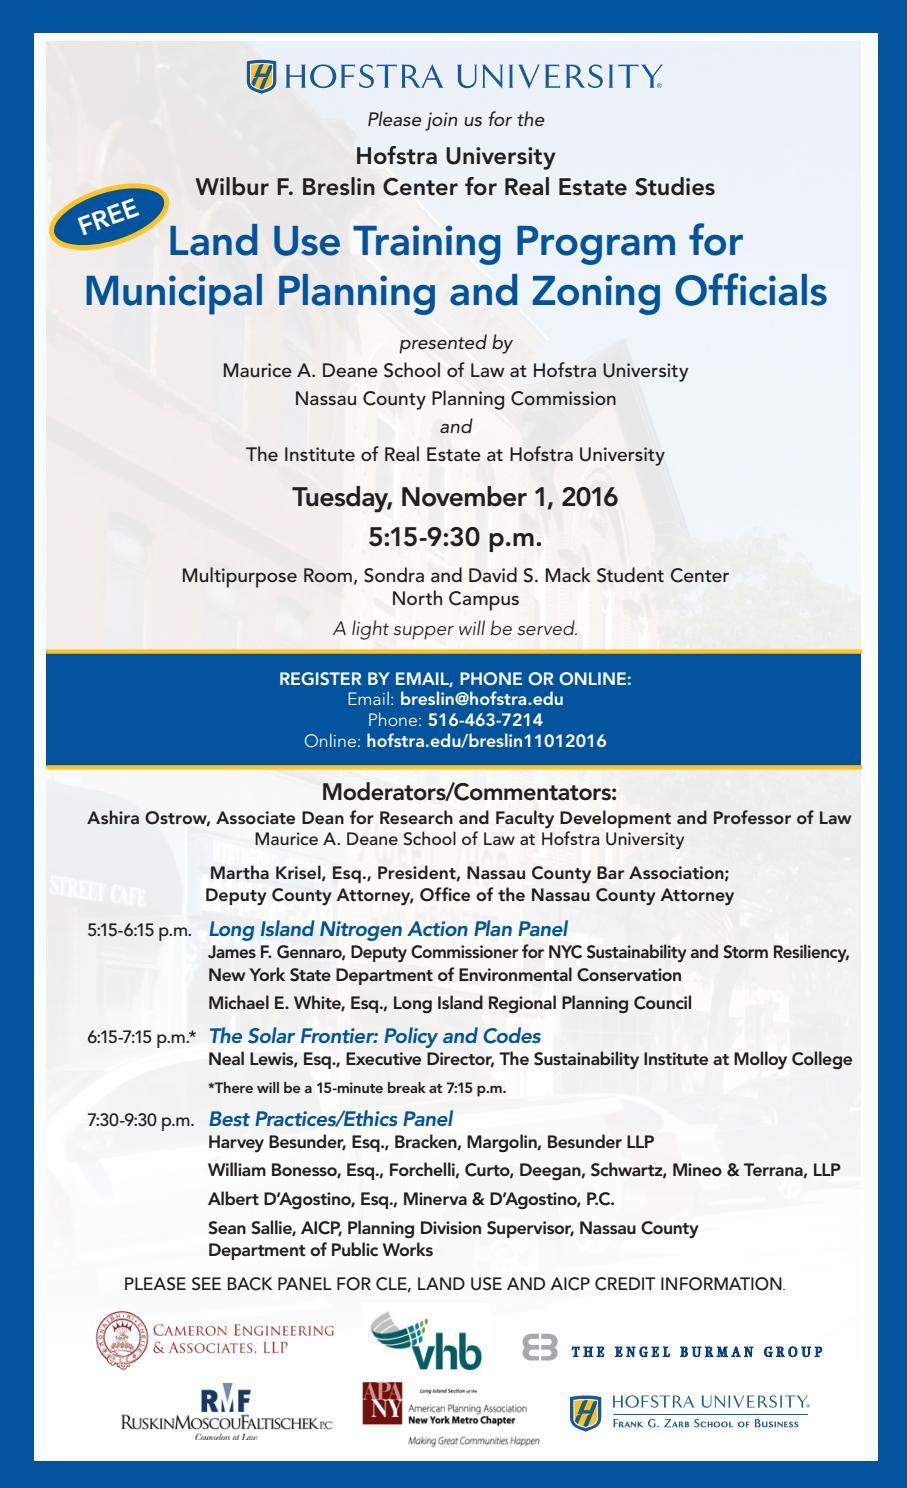 Center For Real Estate Studies: Invite: Land Use Training Program For Municipal Planning